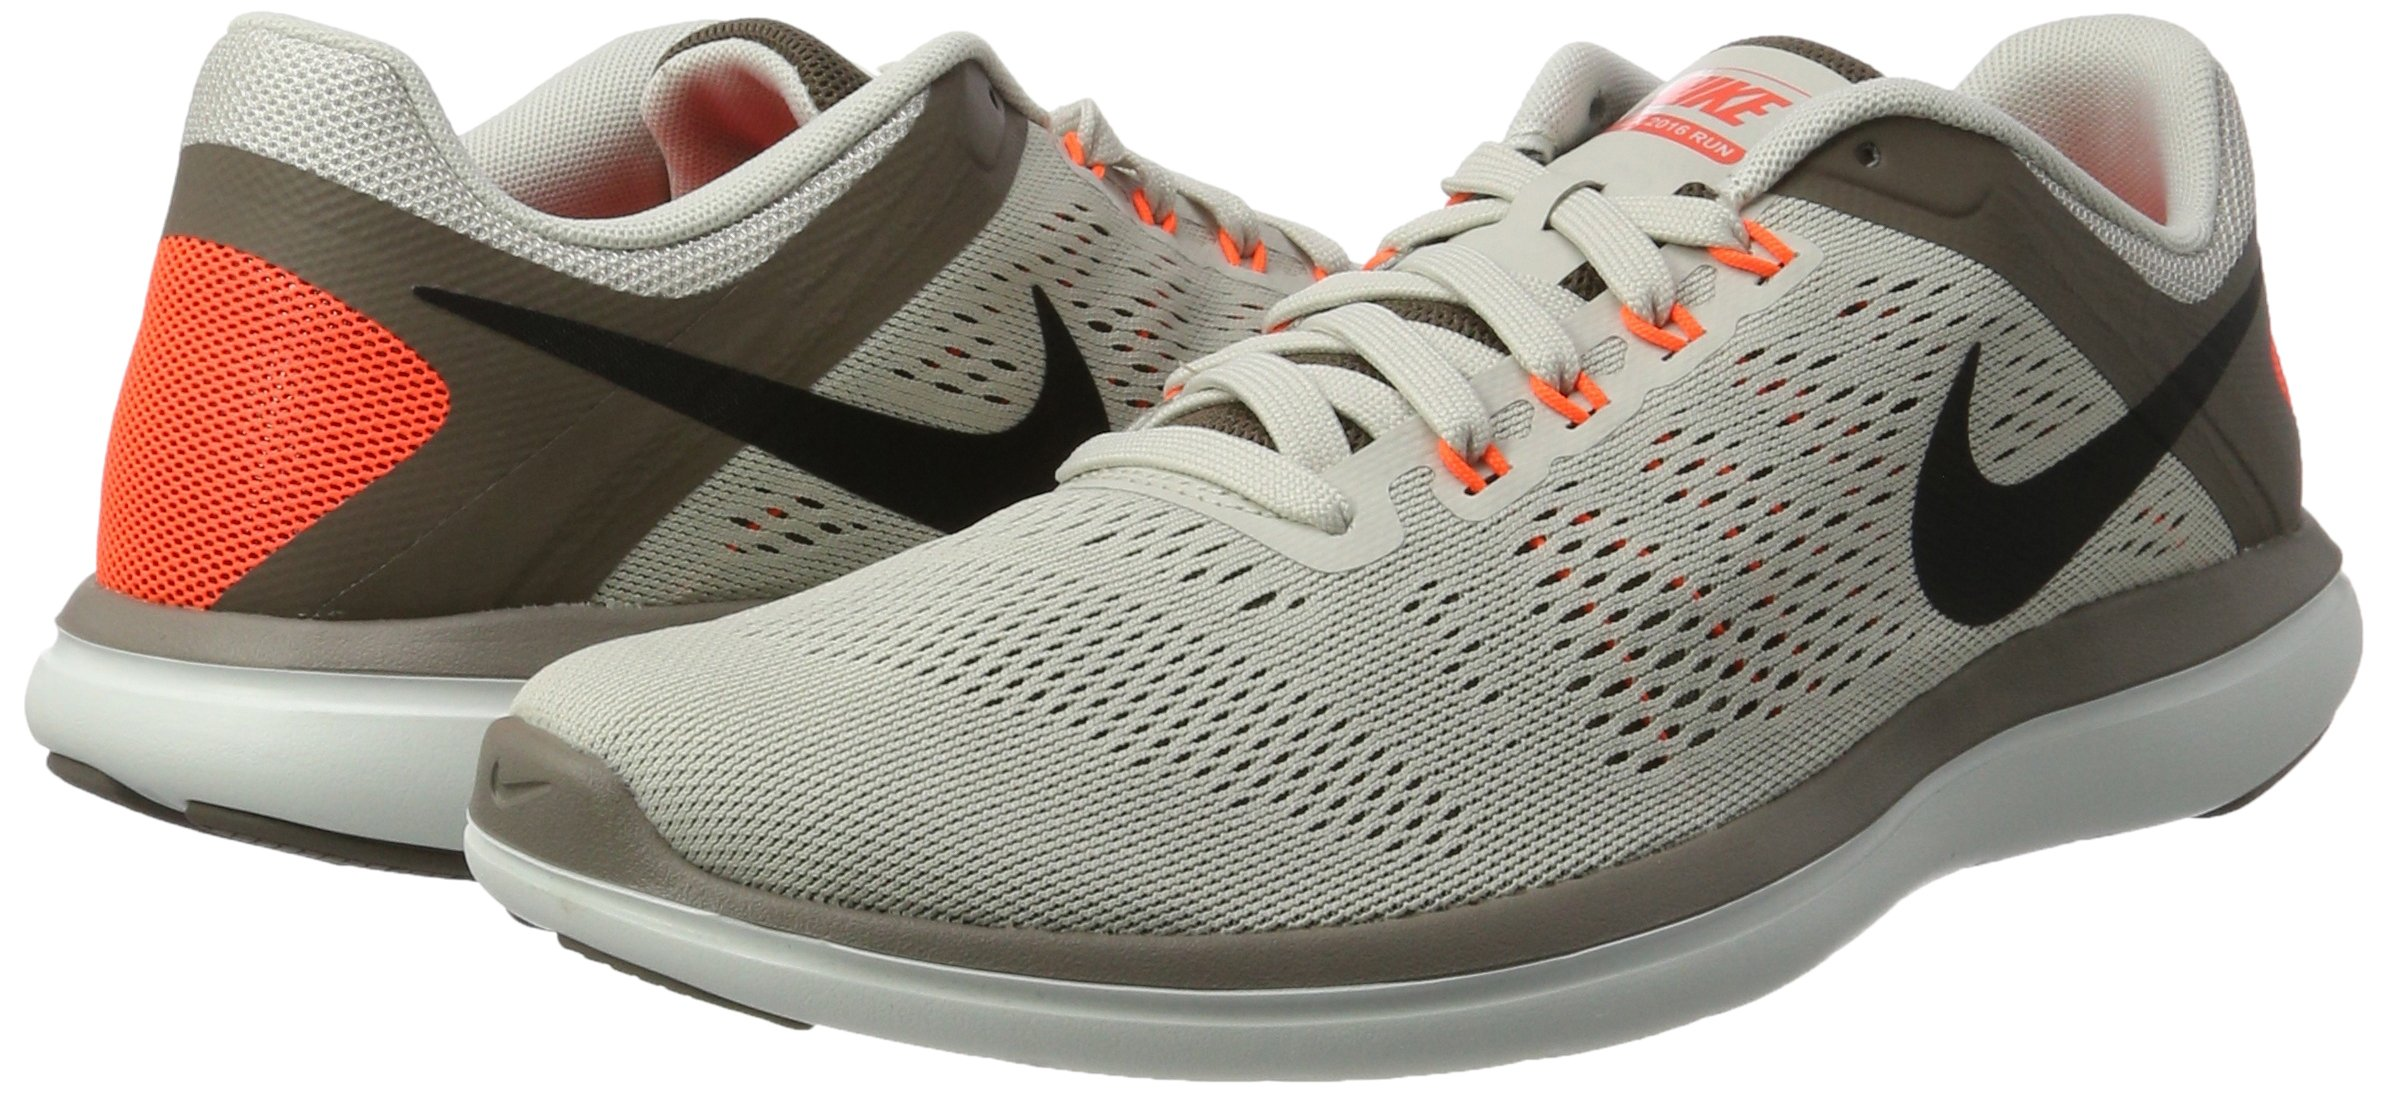 Nike Mens Flex 2016 RN Running Shoe Light Bone/Dark Mushroom/Hyper Orange/Black 8.5 D(M) US by NIKE (Image #5)